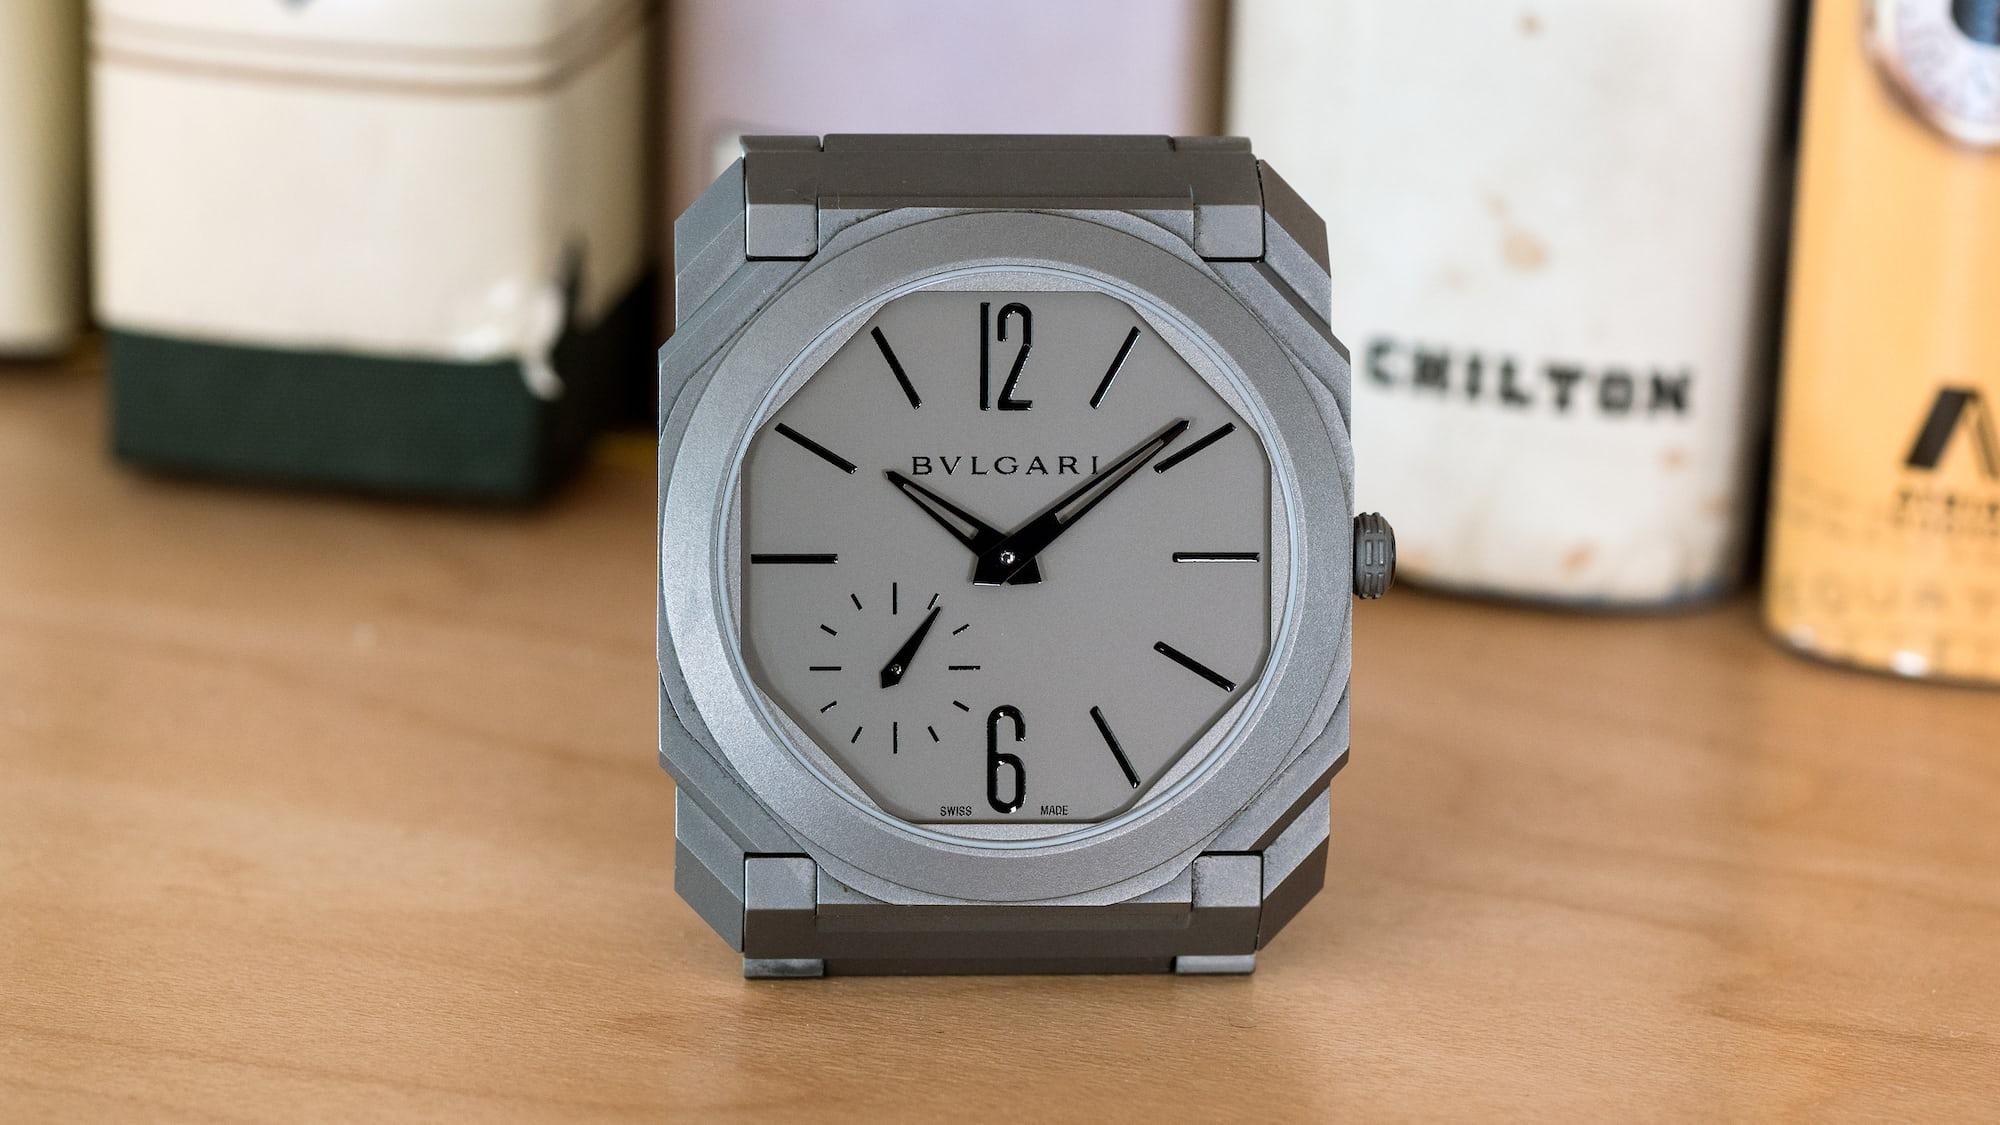 Hero.jpg?ixlib=rails 1.1 A Week On The Wrist: The Bulgari Octo Finissimo Ultra-Thin Automatique A Week On The Wrist: The Bulgari Octo Finissimo Ultra-Thin Automatique hero